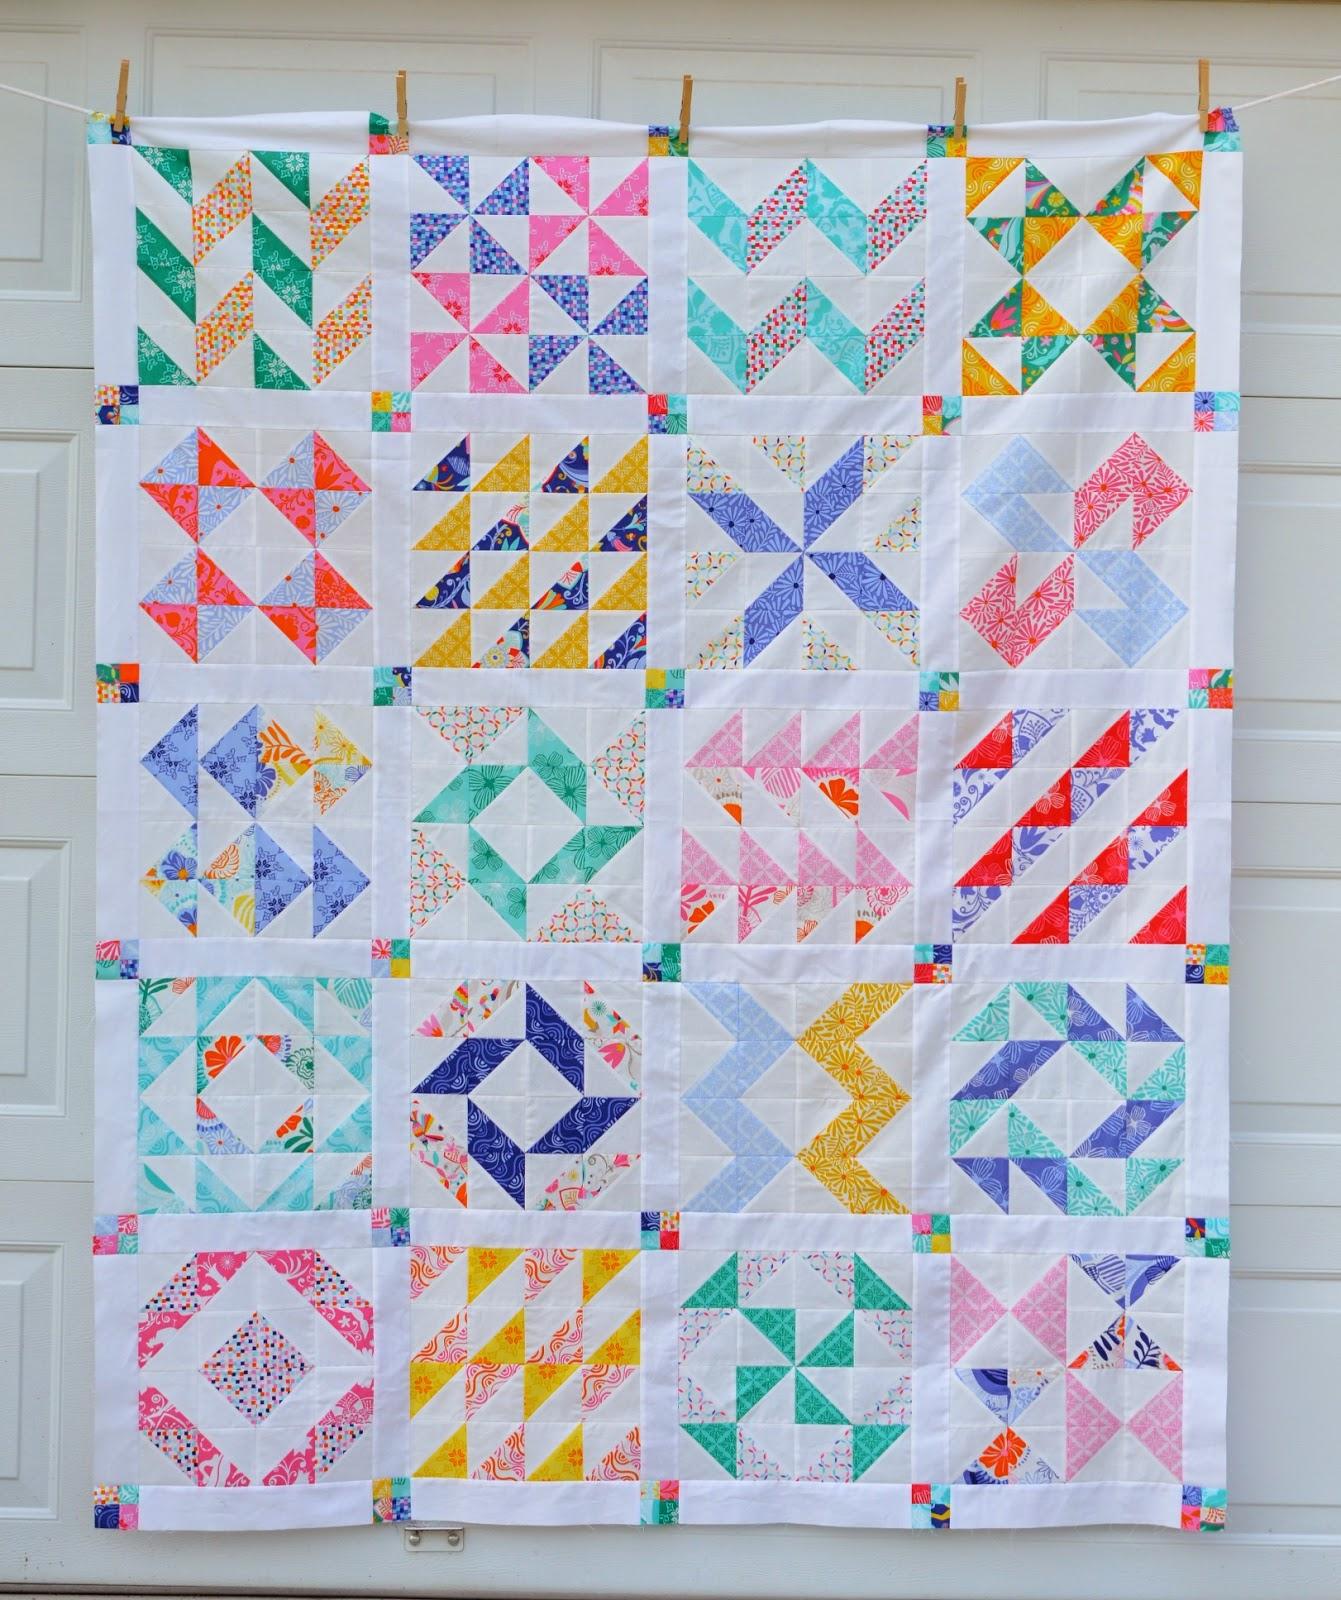 Layer Cake Quilt Pattern Ideas : Hyacinth Quilt Designs: Layer Cake Sampler QAL